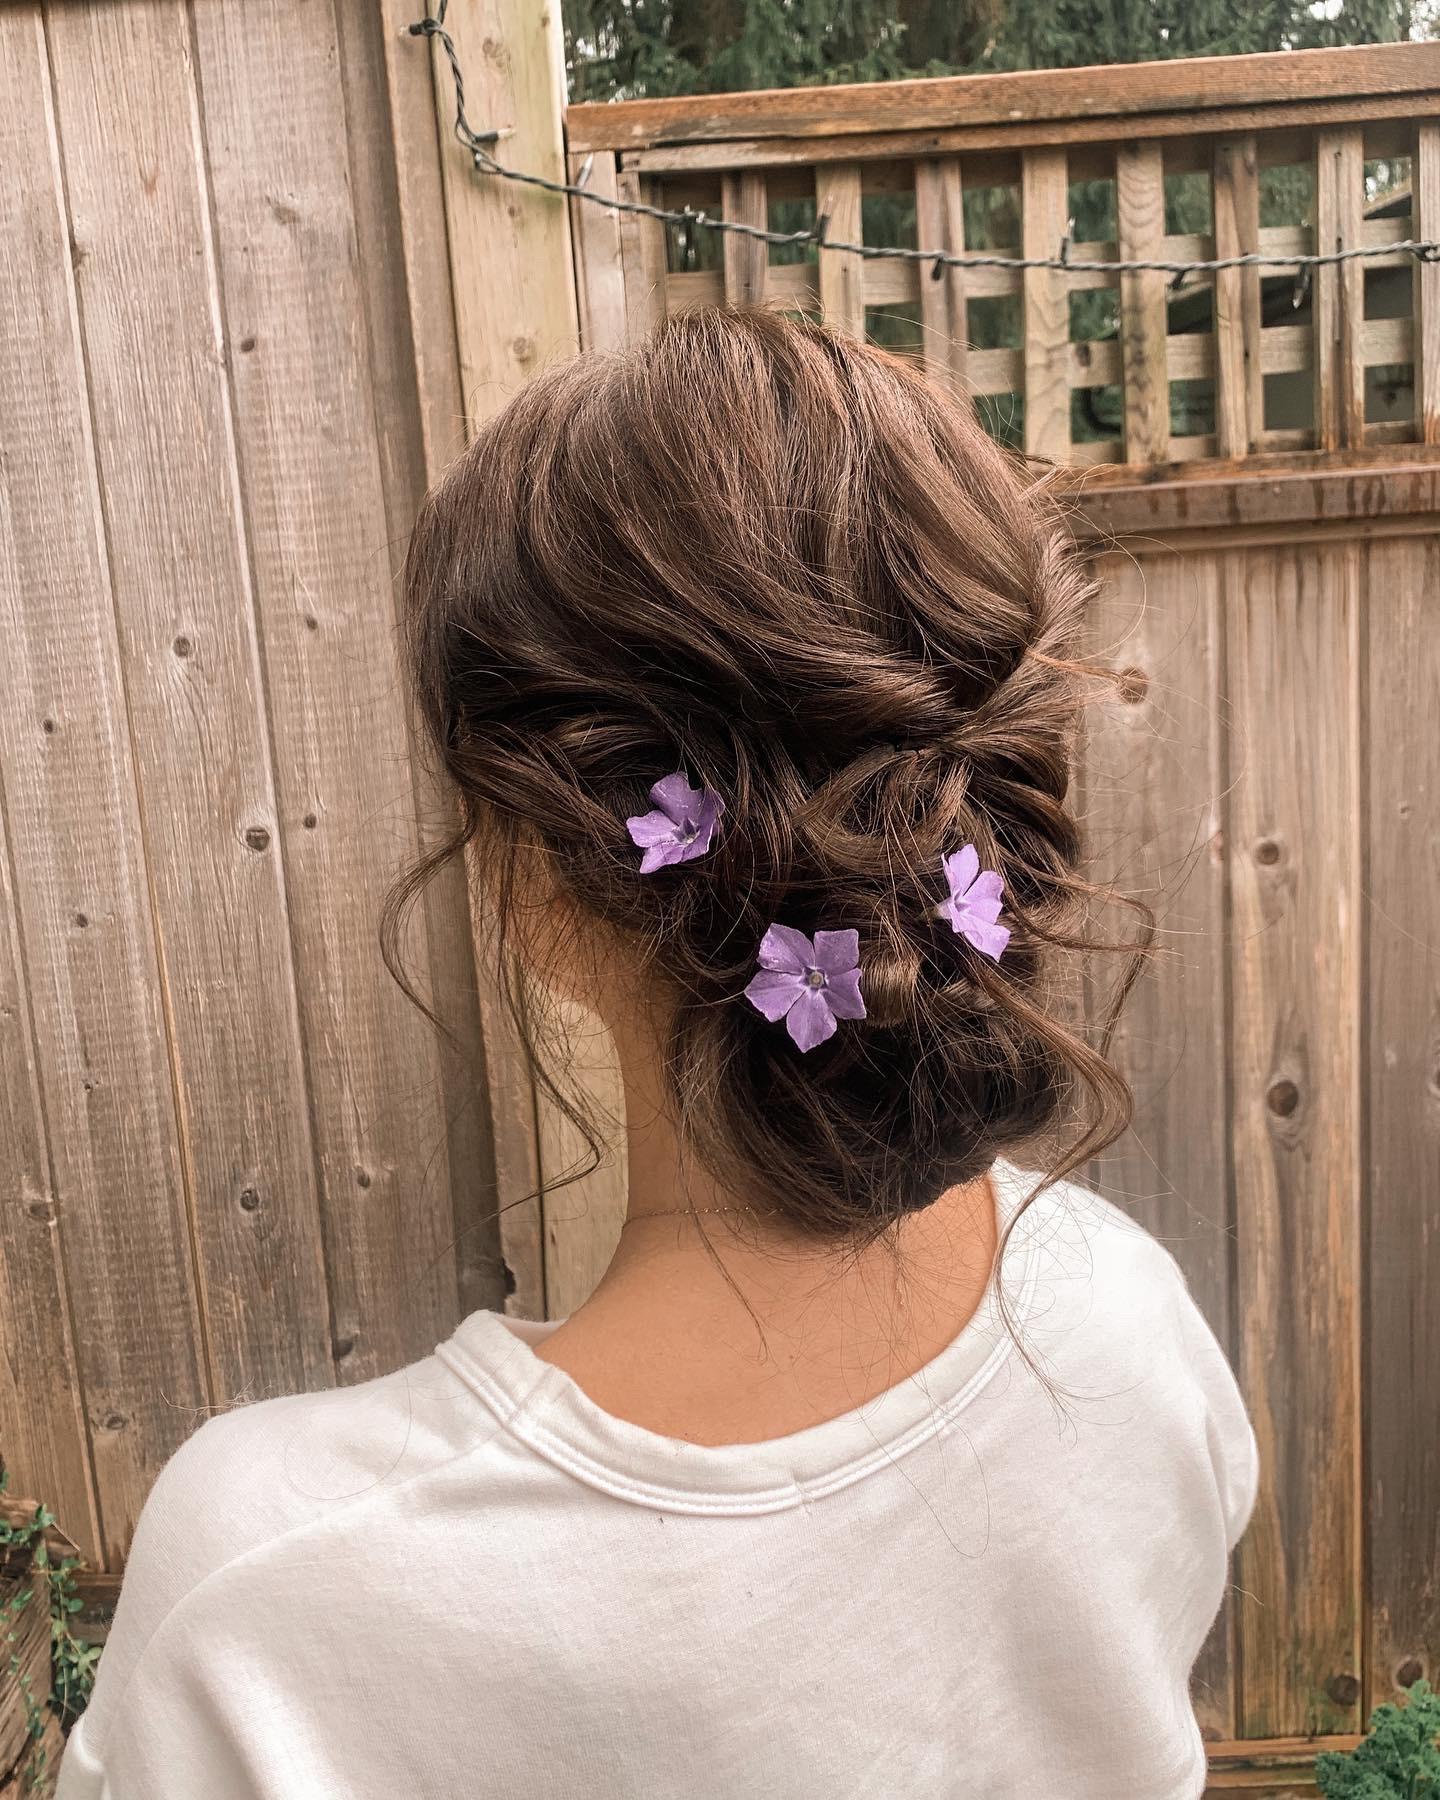 Bridal Hair (No Trial)